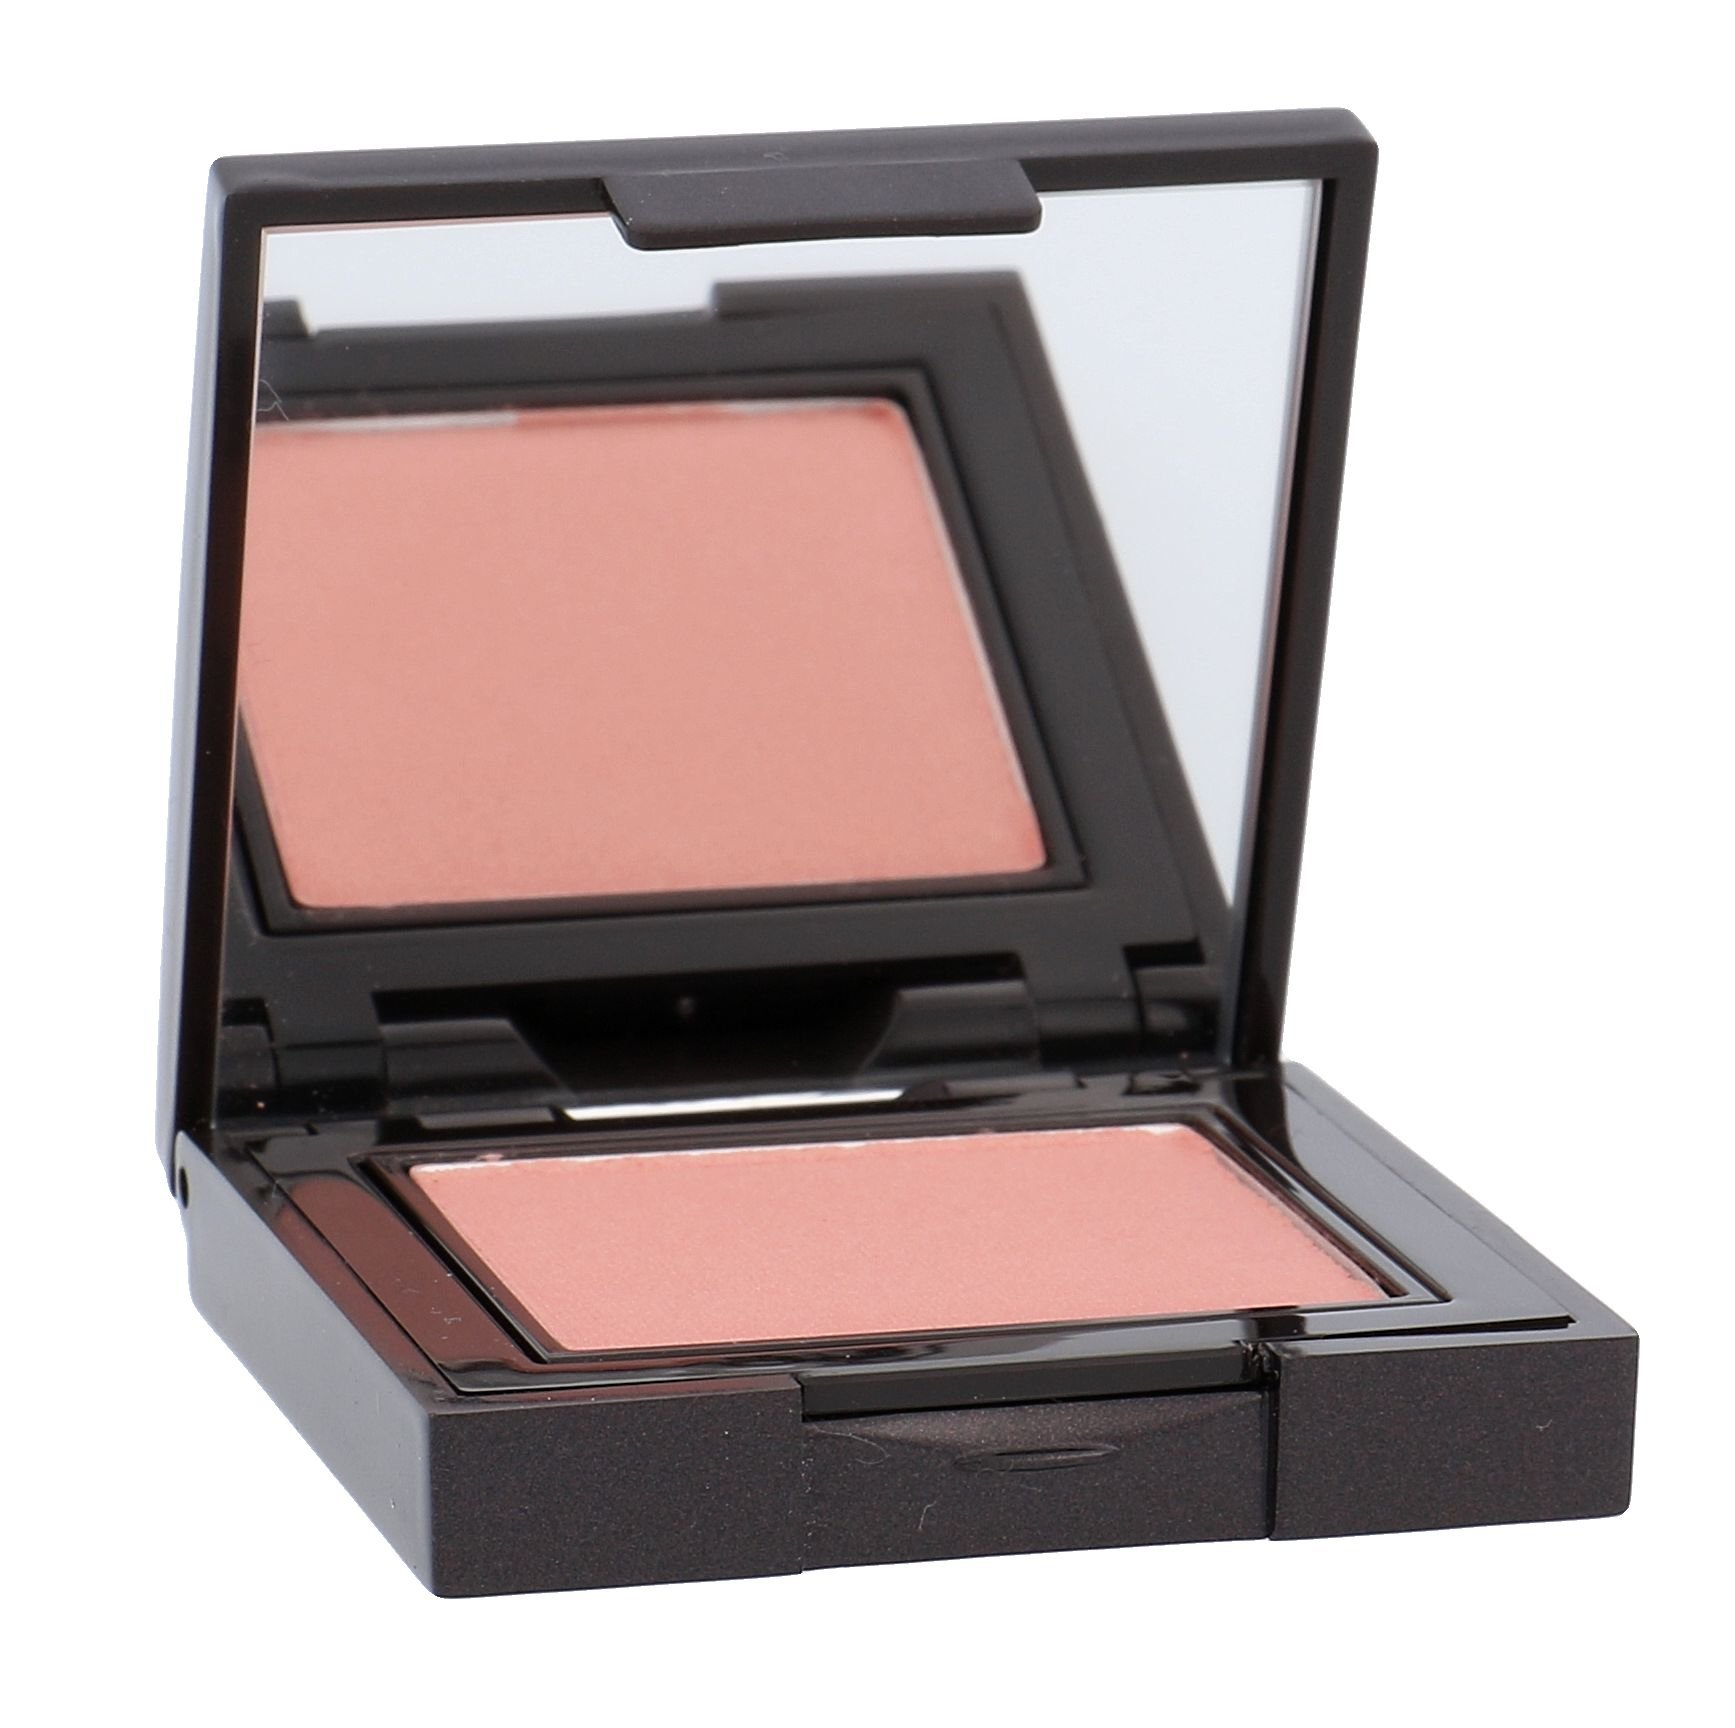 Laura Mercier Second Skin Cheek Colour Cosmetic 3,6ml Orange Blossom